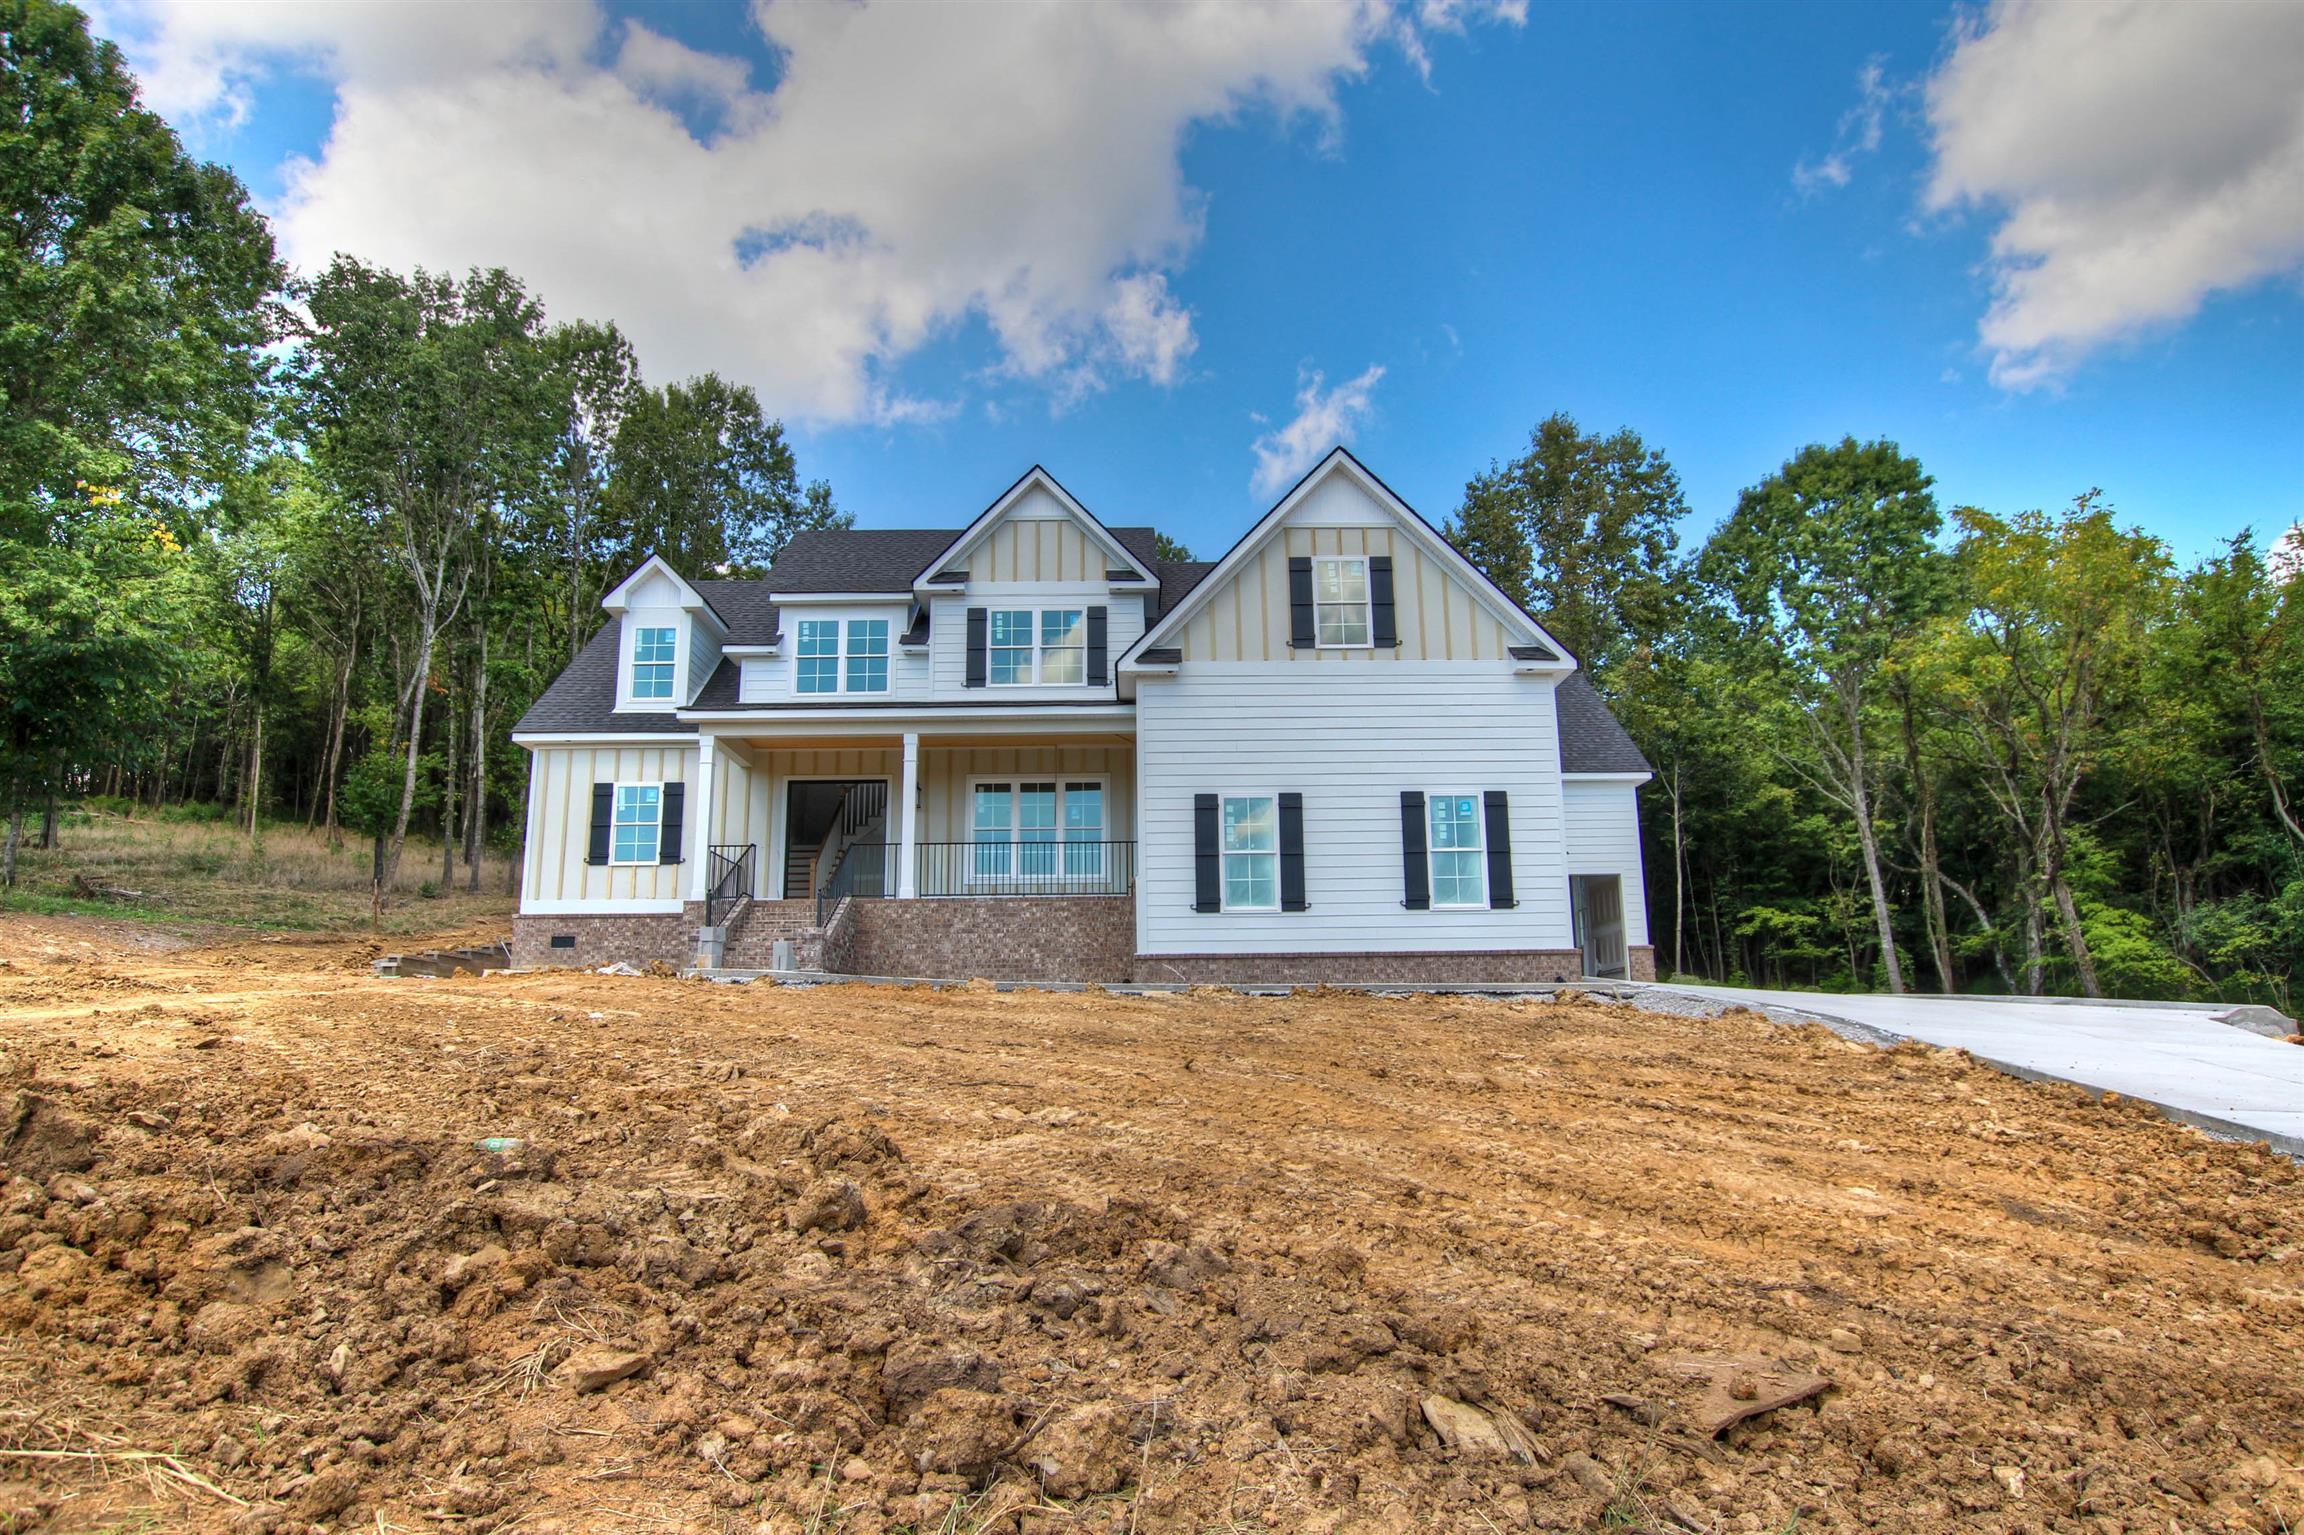 1152 Cheatham Springs Rd, Eagleville, TN 37060 - Eagleville, TN real estate listing